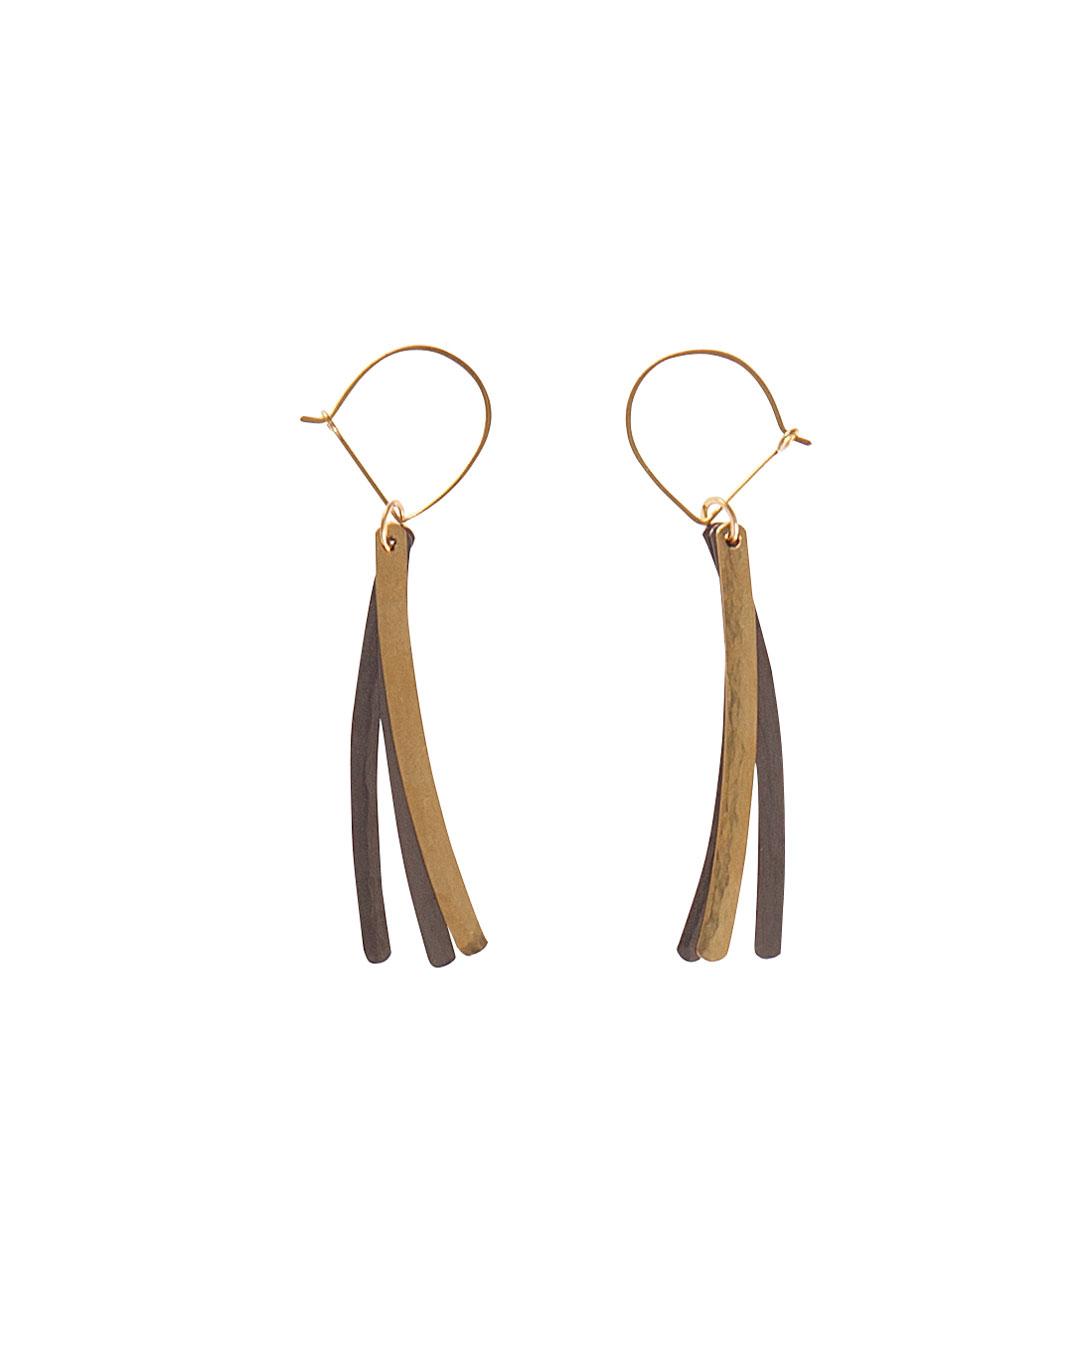 Annelies Planteijdt, Mooie Stad – Zwarte gouden kristal (Beautiful City - Black Gold Crystal), 2015, earrings; gold, tantalum, 60 x 90 mm, €850